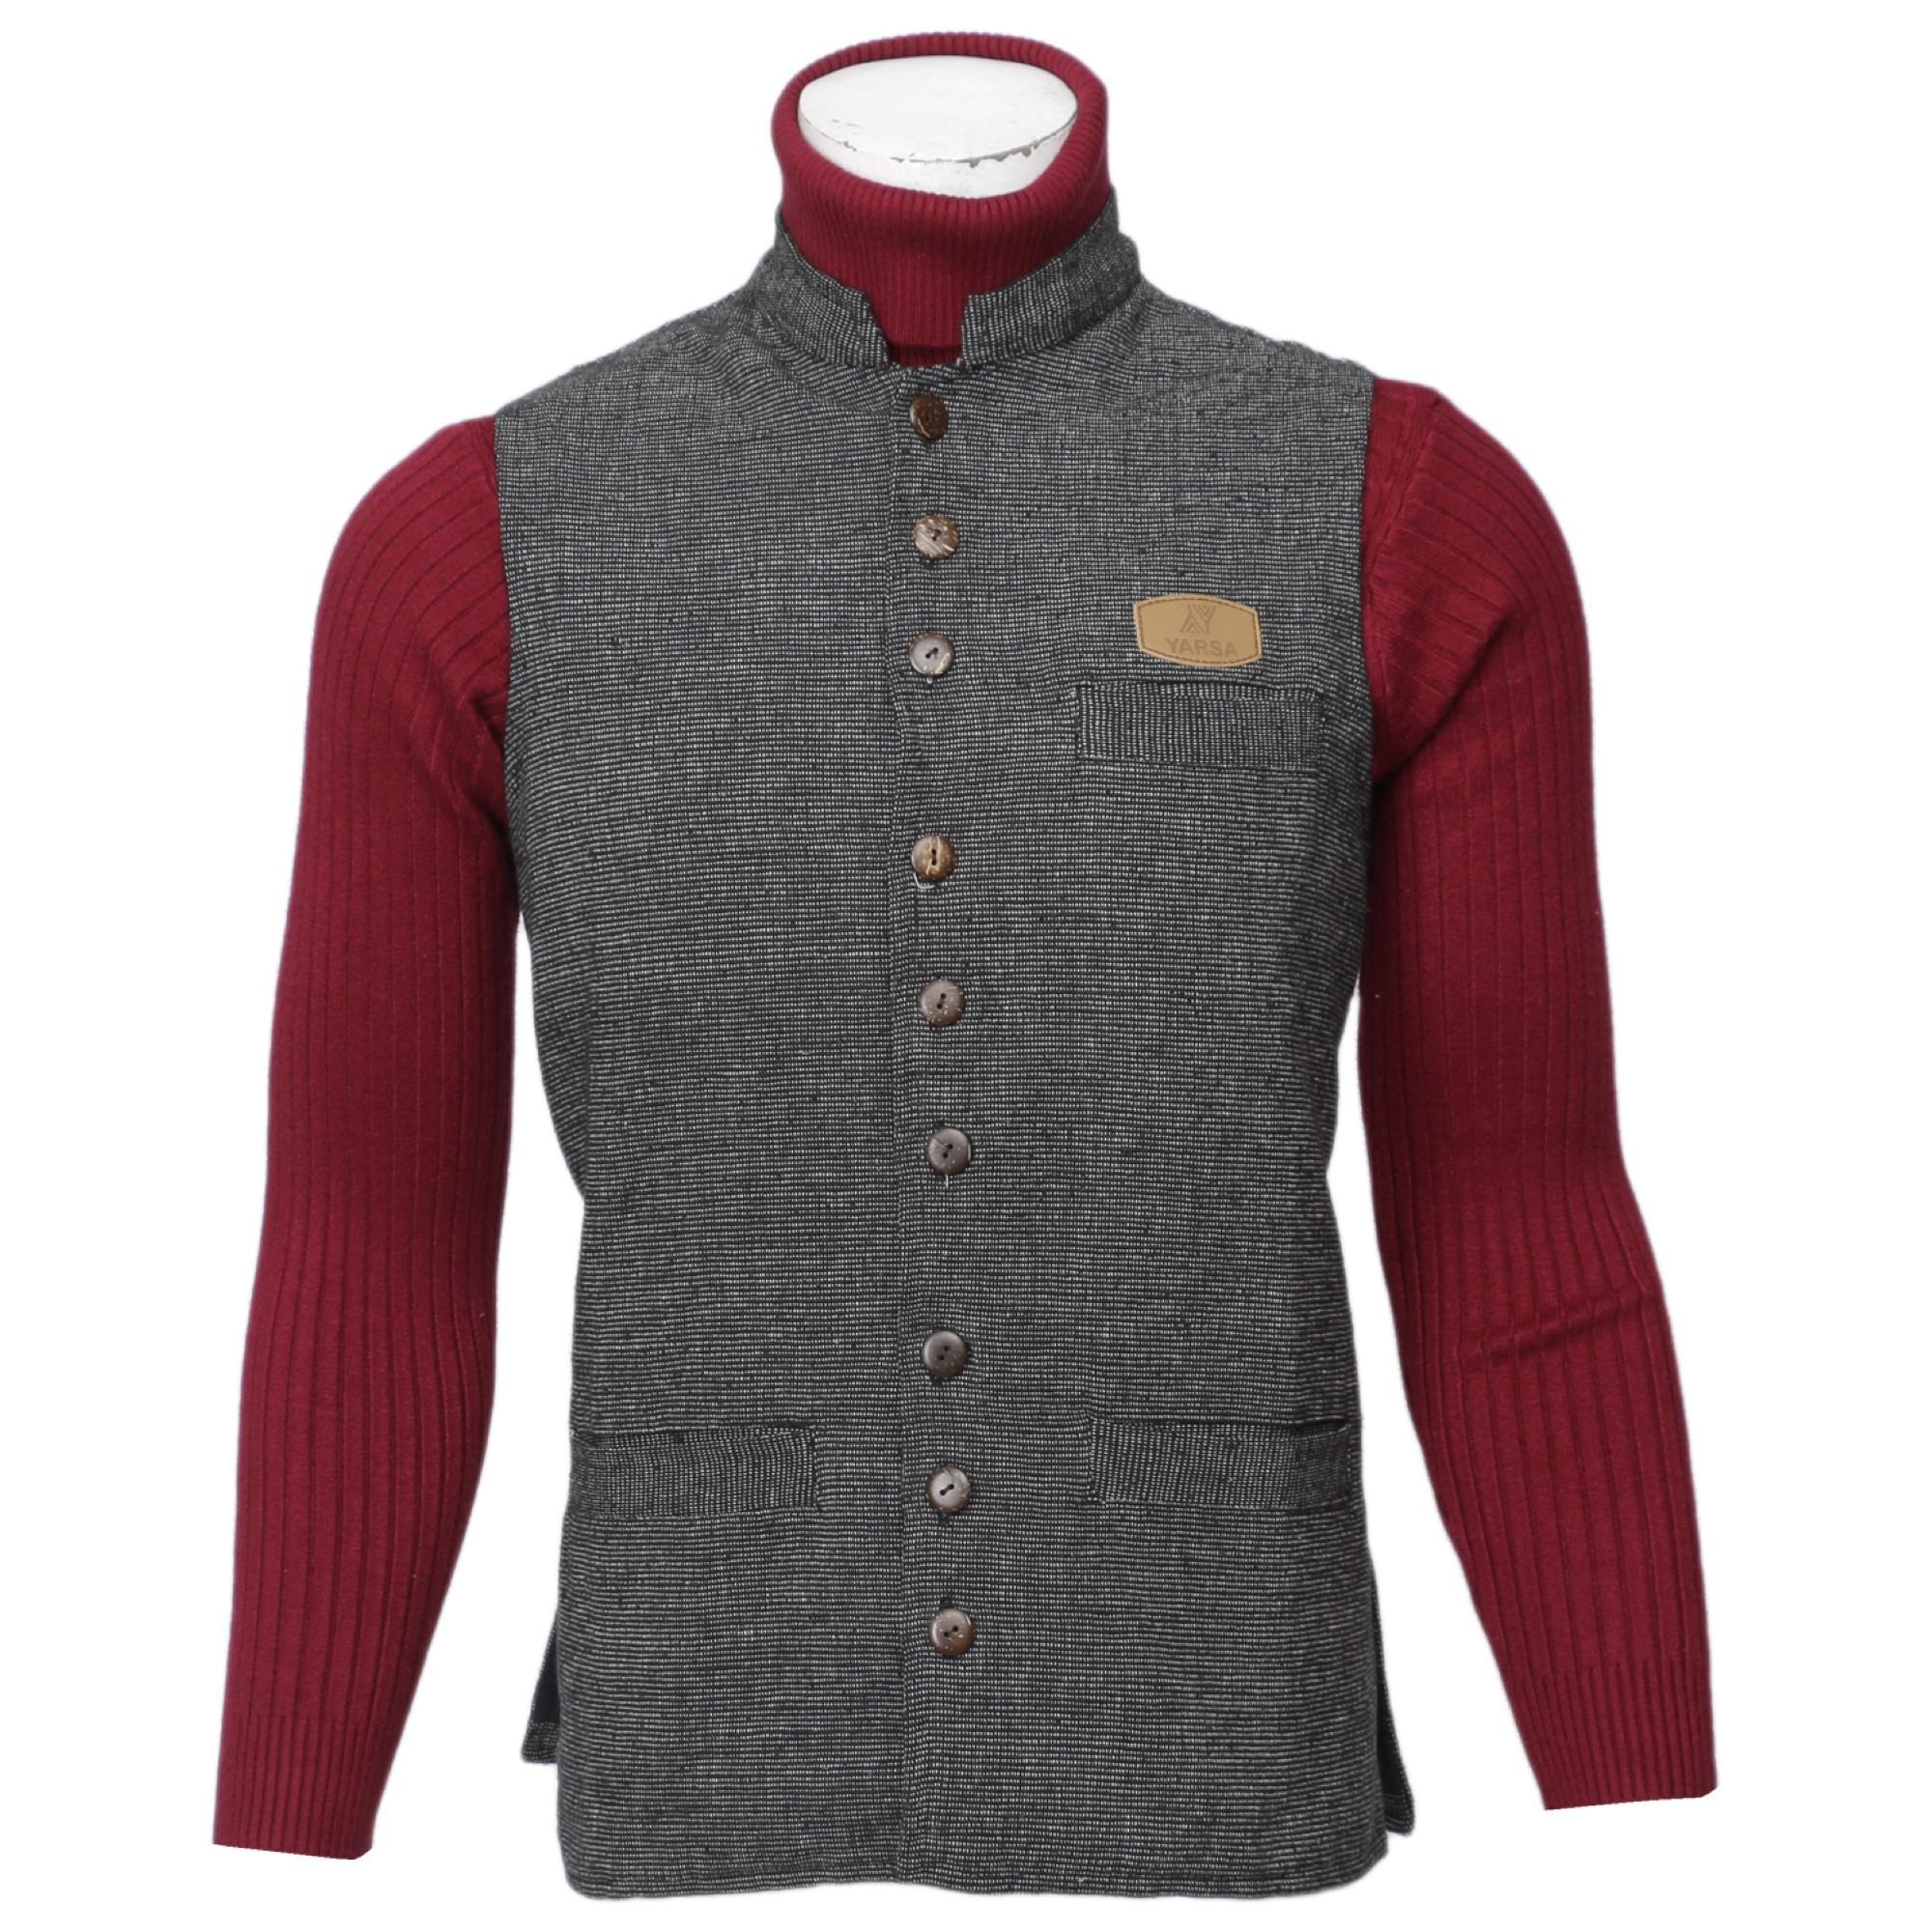 2305536320f Men s Jackets Price in Nepal - Buy Jackets For Men Online - Daraz.com.np